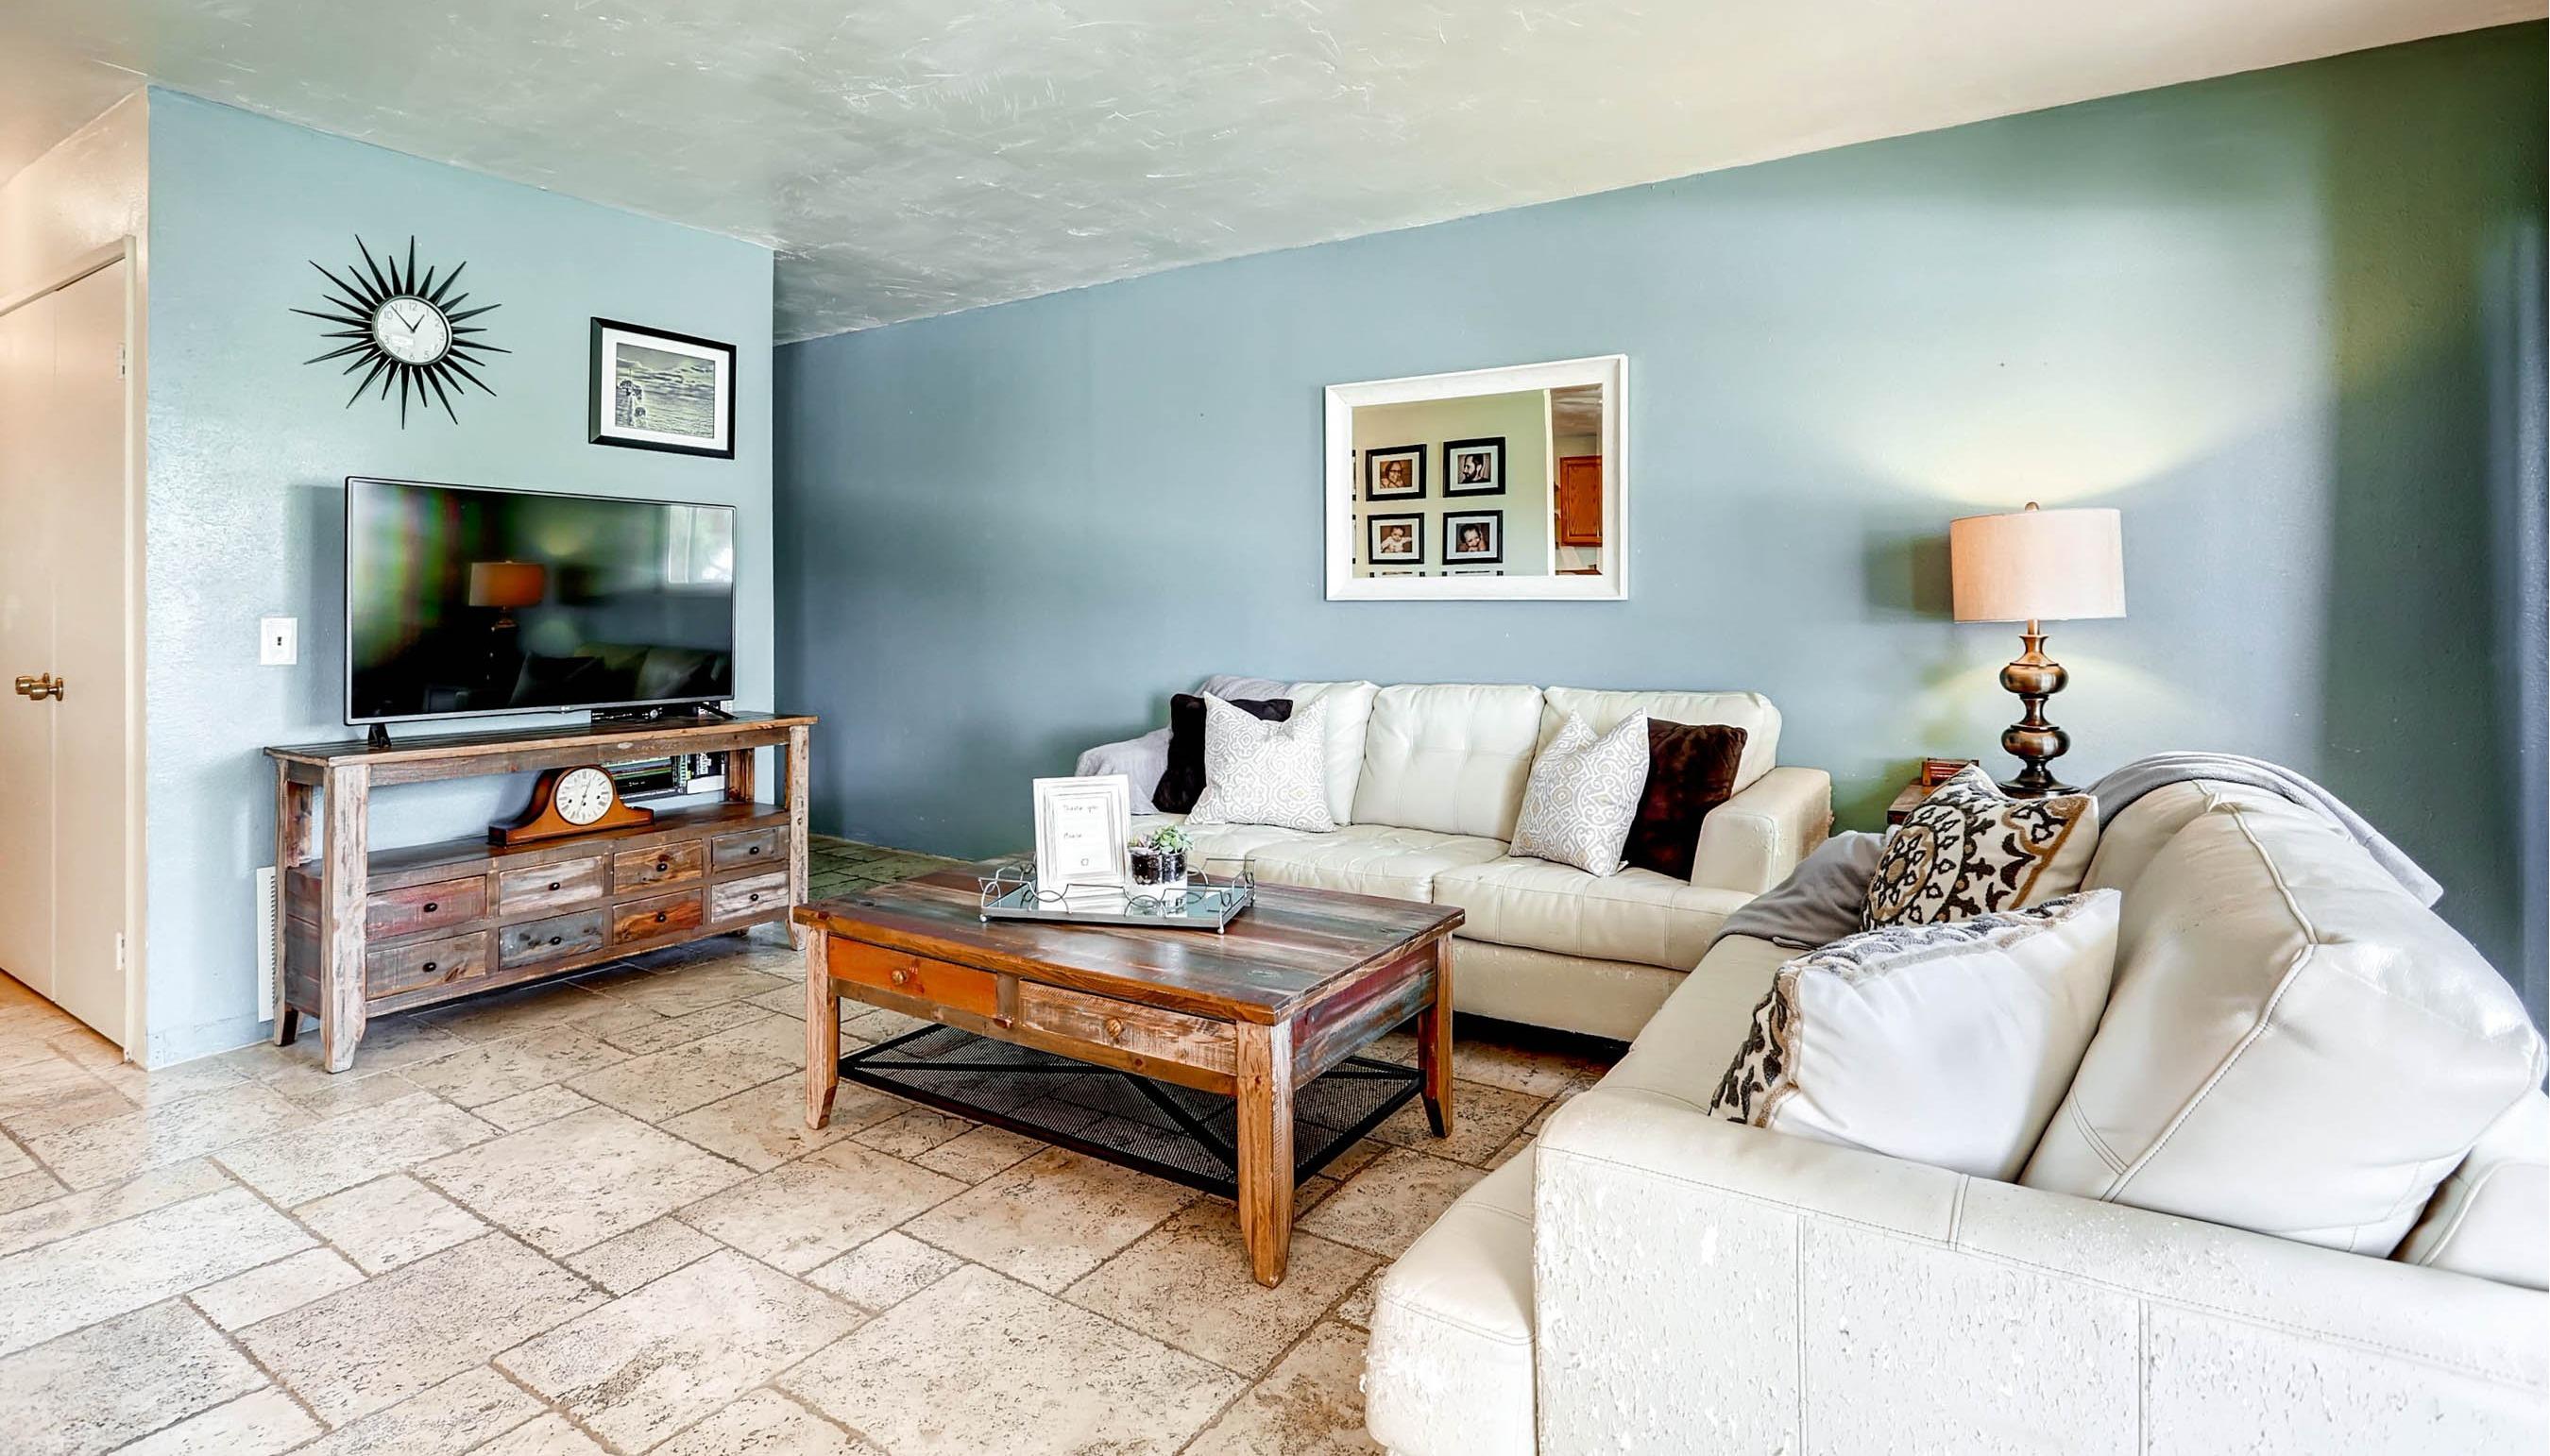 The Coleman Jordan GroupSan Diego Choice Real Estate | #01721750